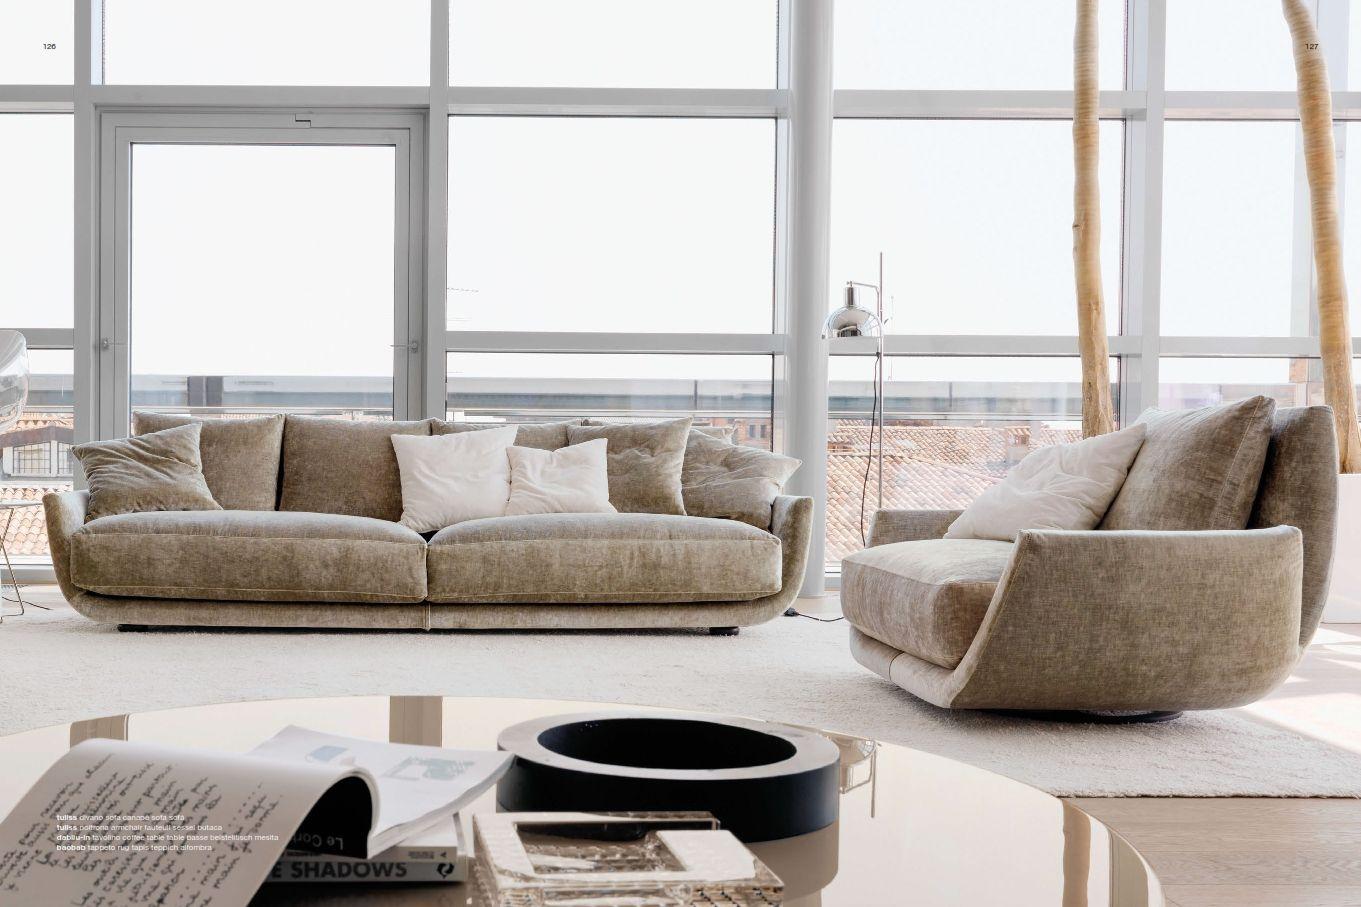 desiree furniture.  Furniture VIP Upholstered Furniture DESIREE TULISS Series Inside Desiree